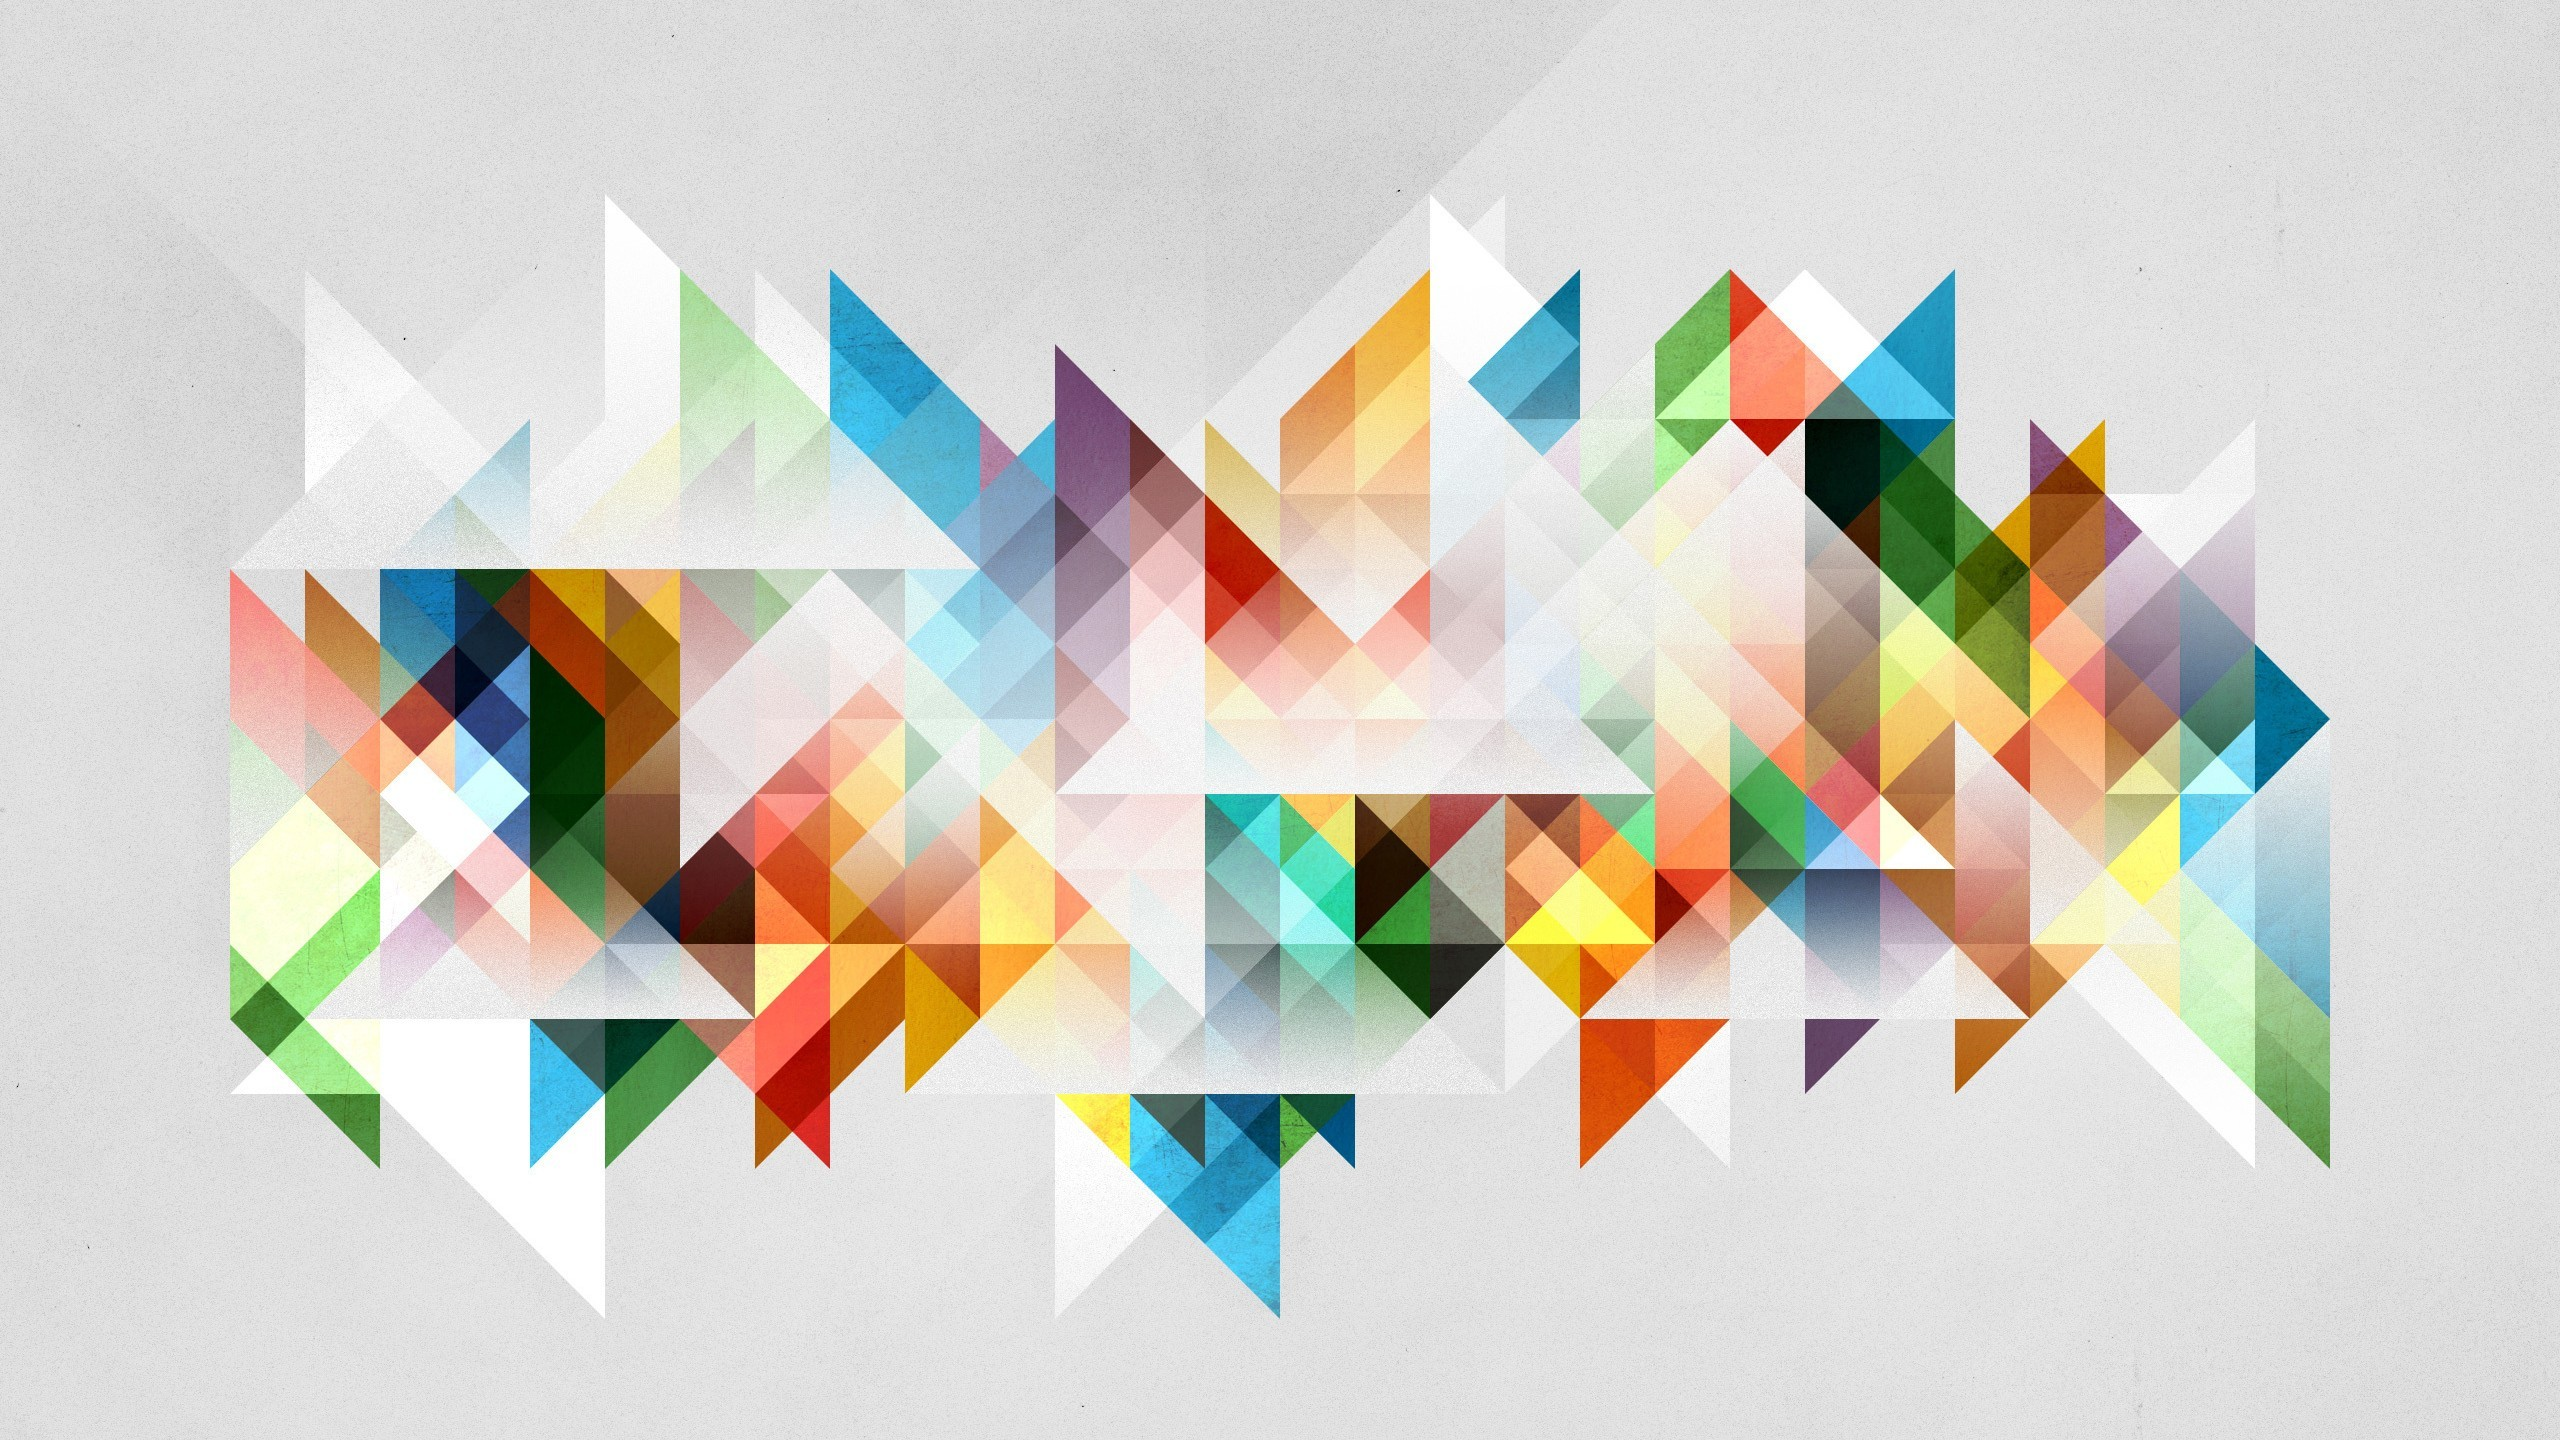 Artistic Backgrounds wallpaper 2560x1440 75329 2560x1440